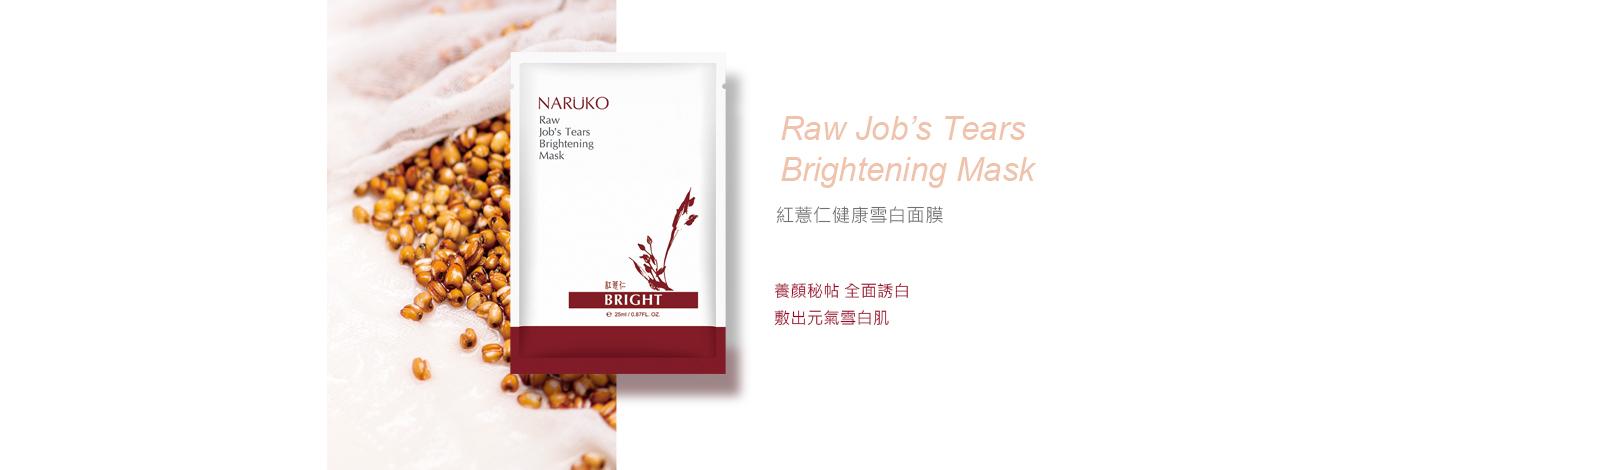 rjt-mask-cn-1-.jpg